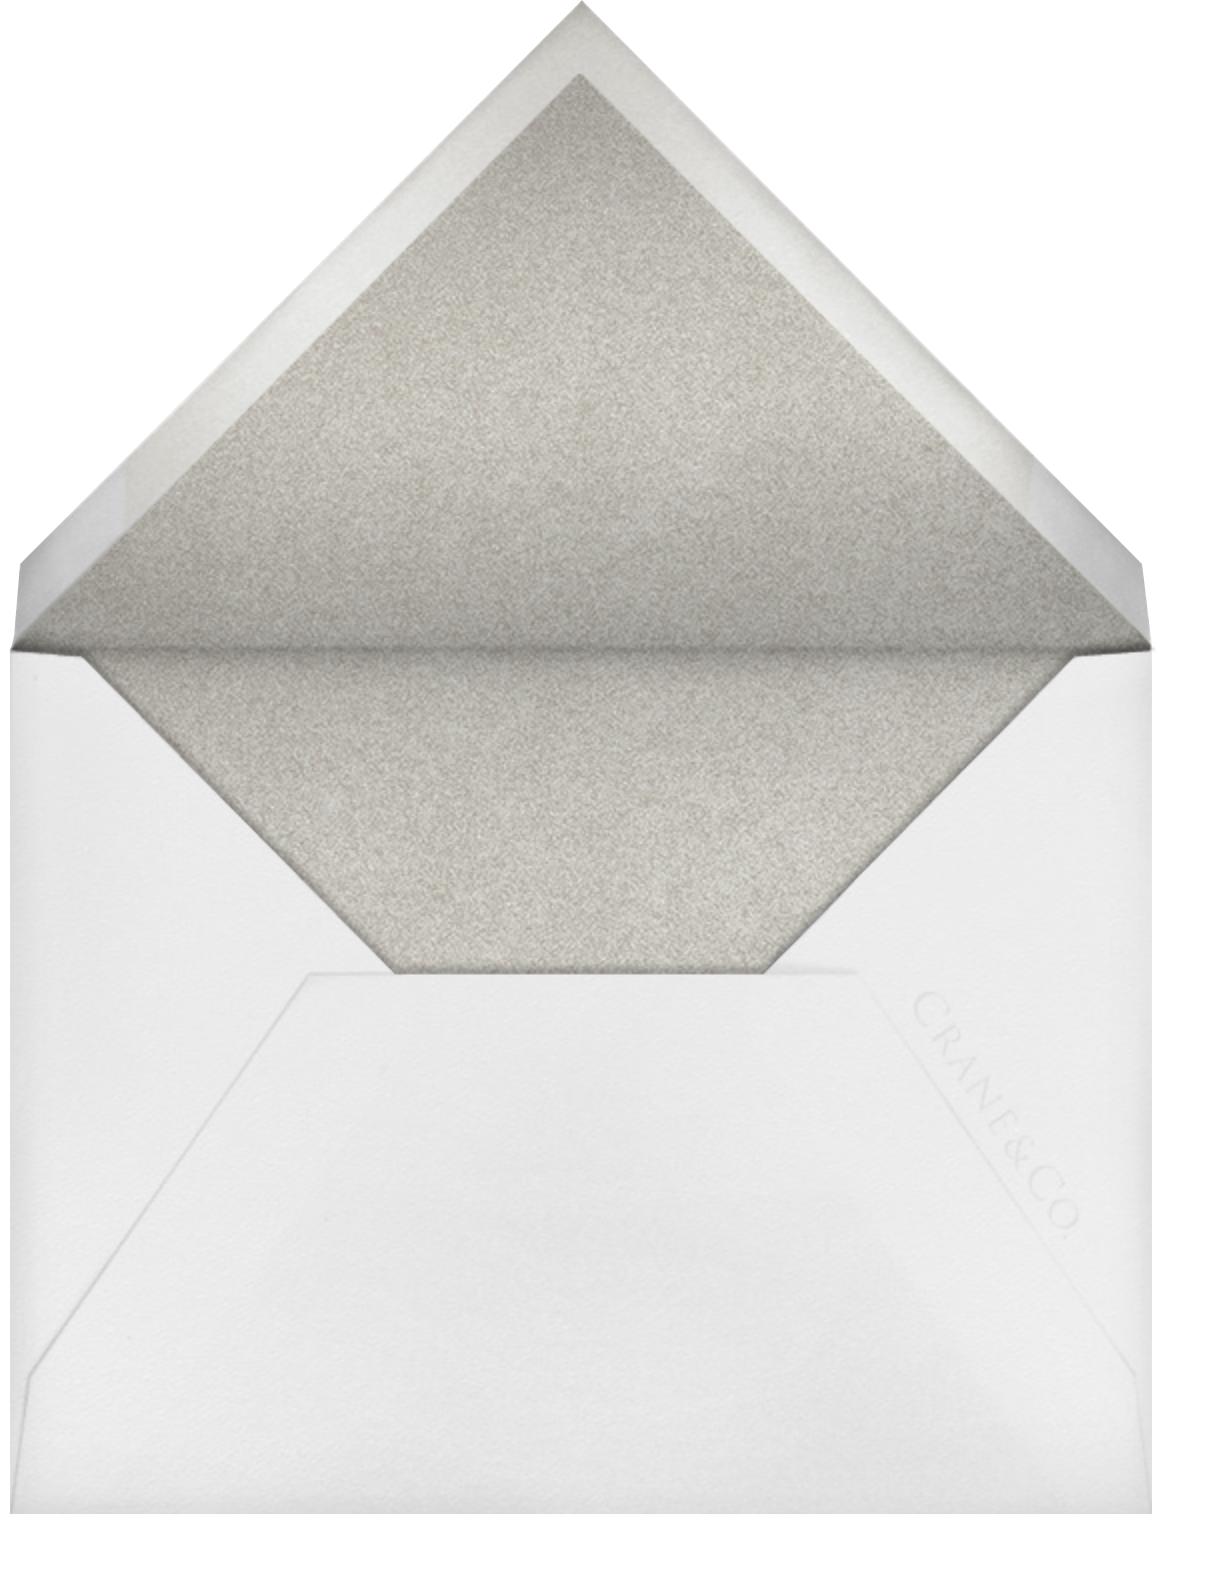 Collins Avenue (Thank You) - Platinum - Crane & Co. - Envelope